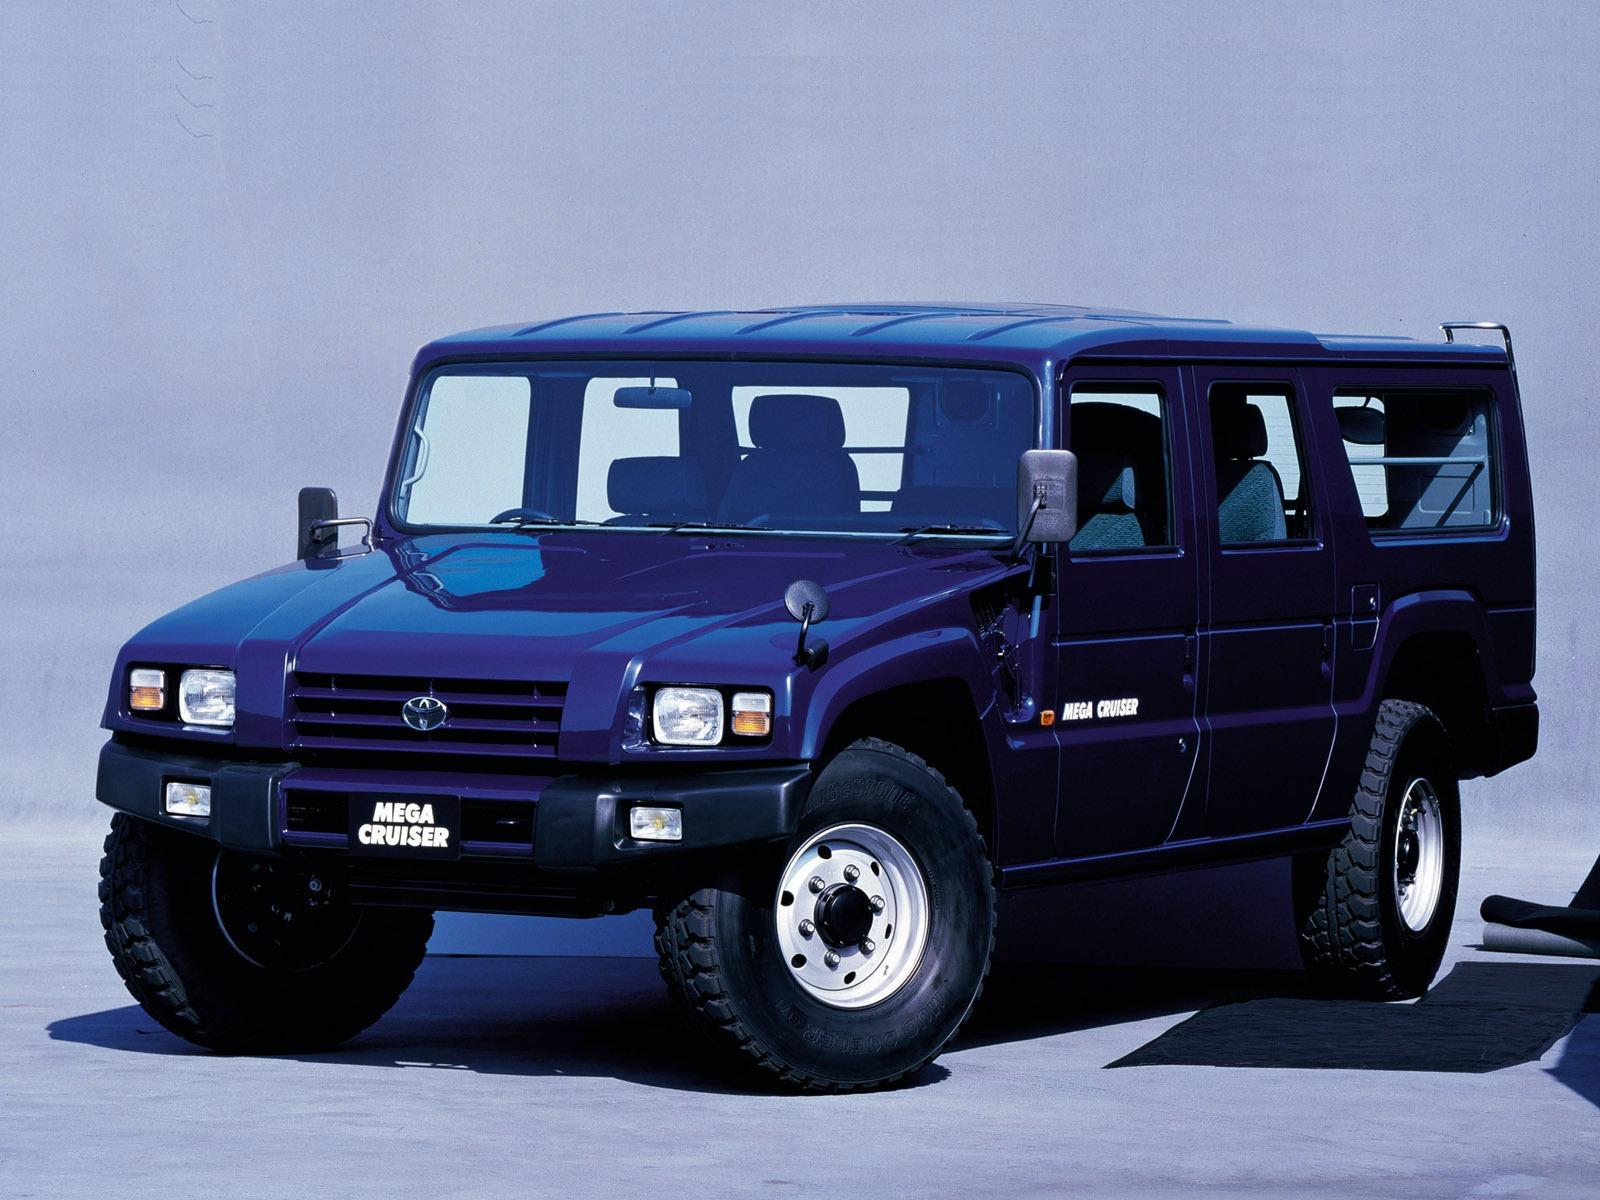 Toyota_Mega_Cruiser_0004